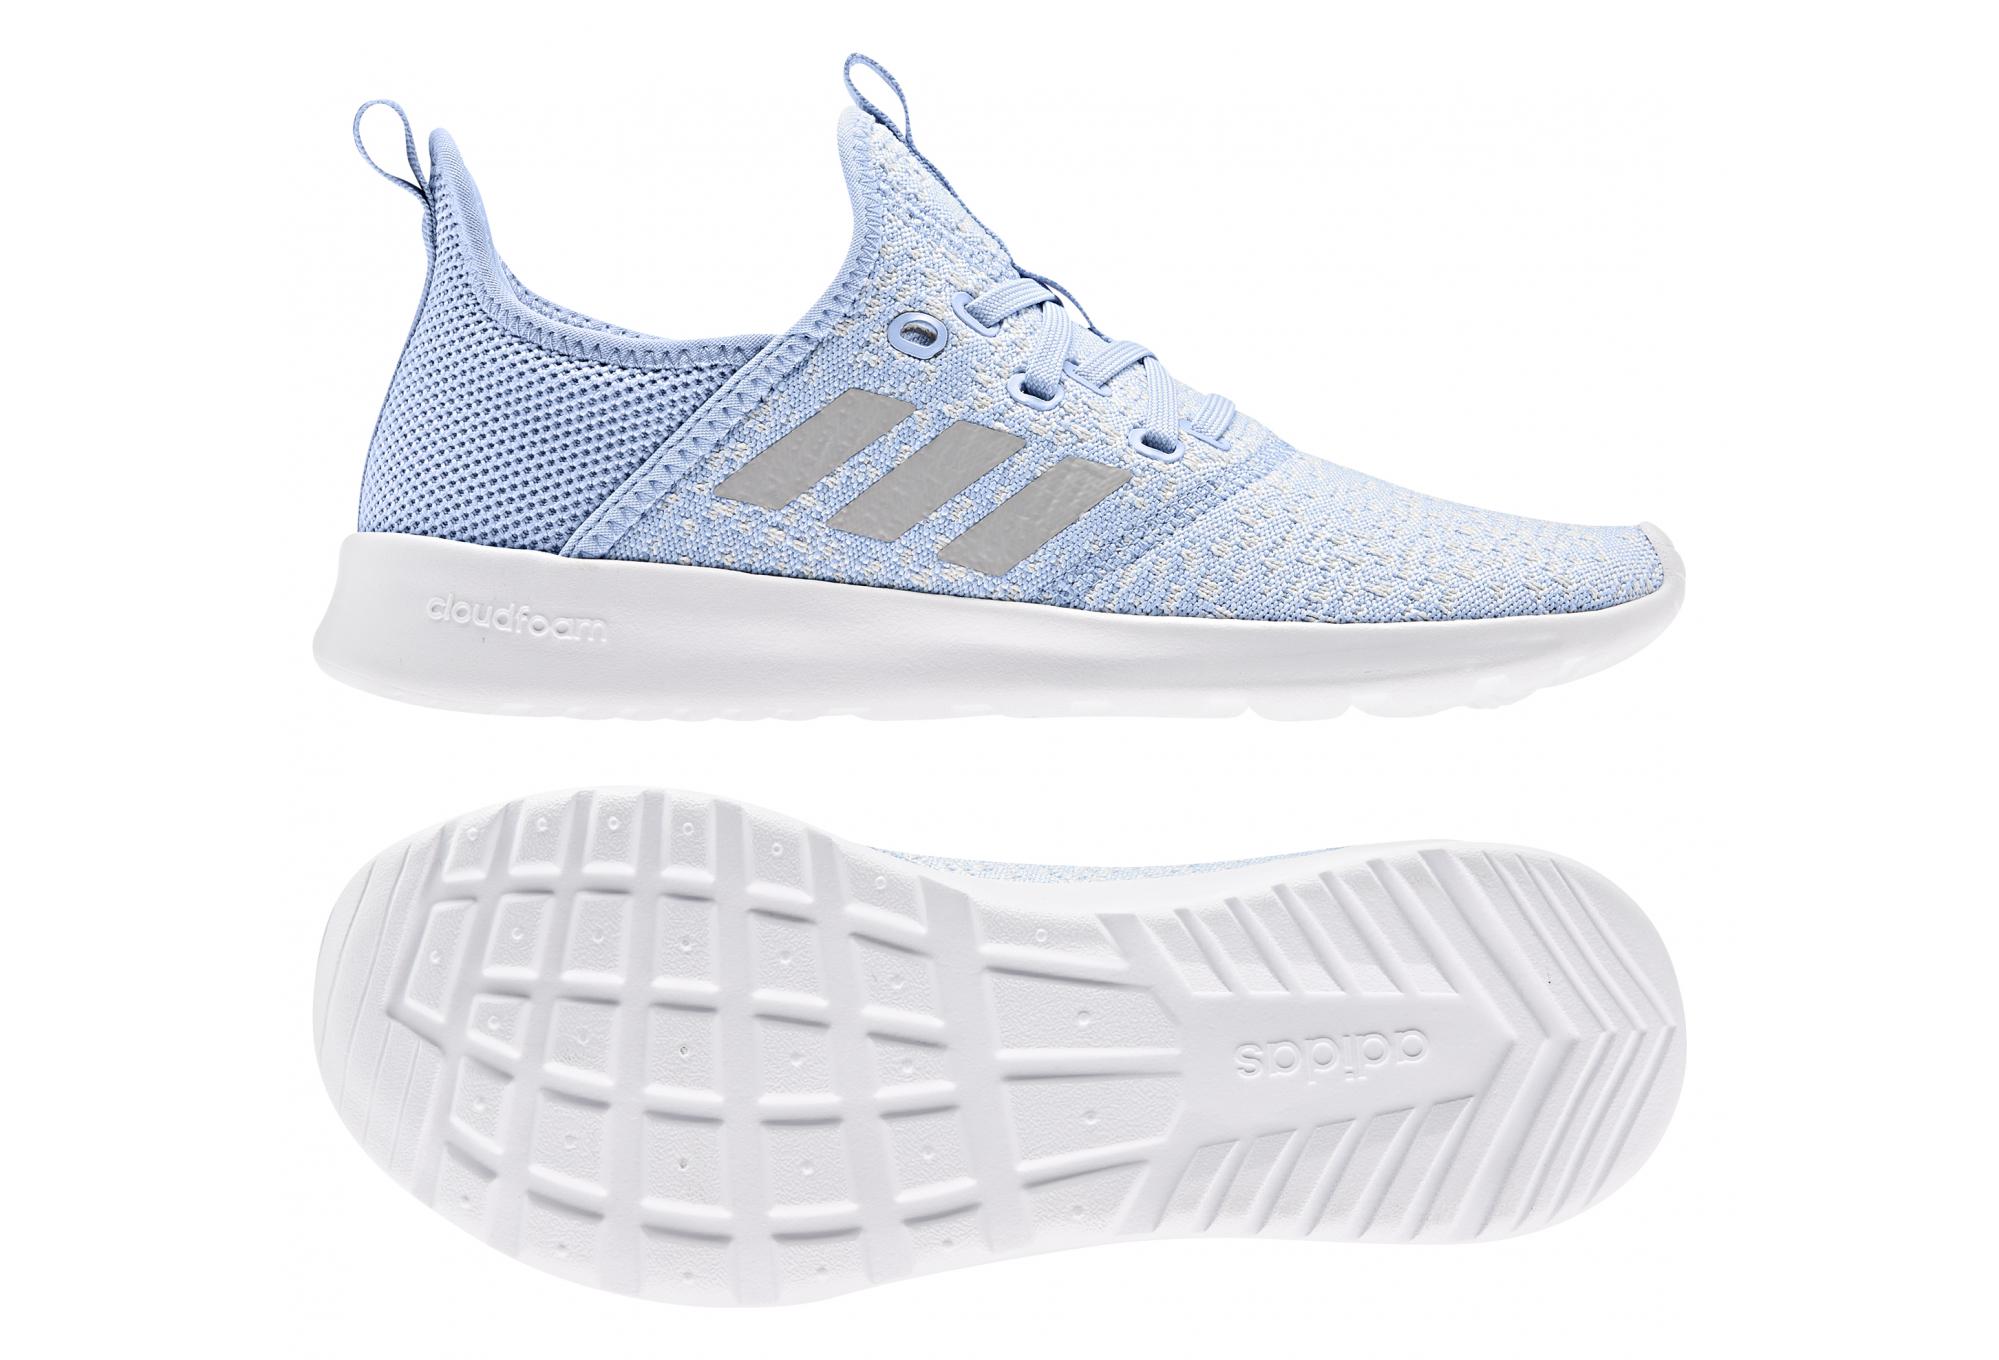 Chaussures femme adidas Cloudfoam Pure